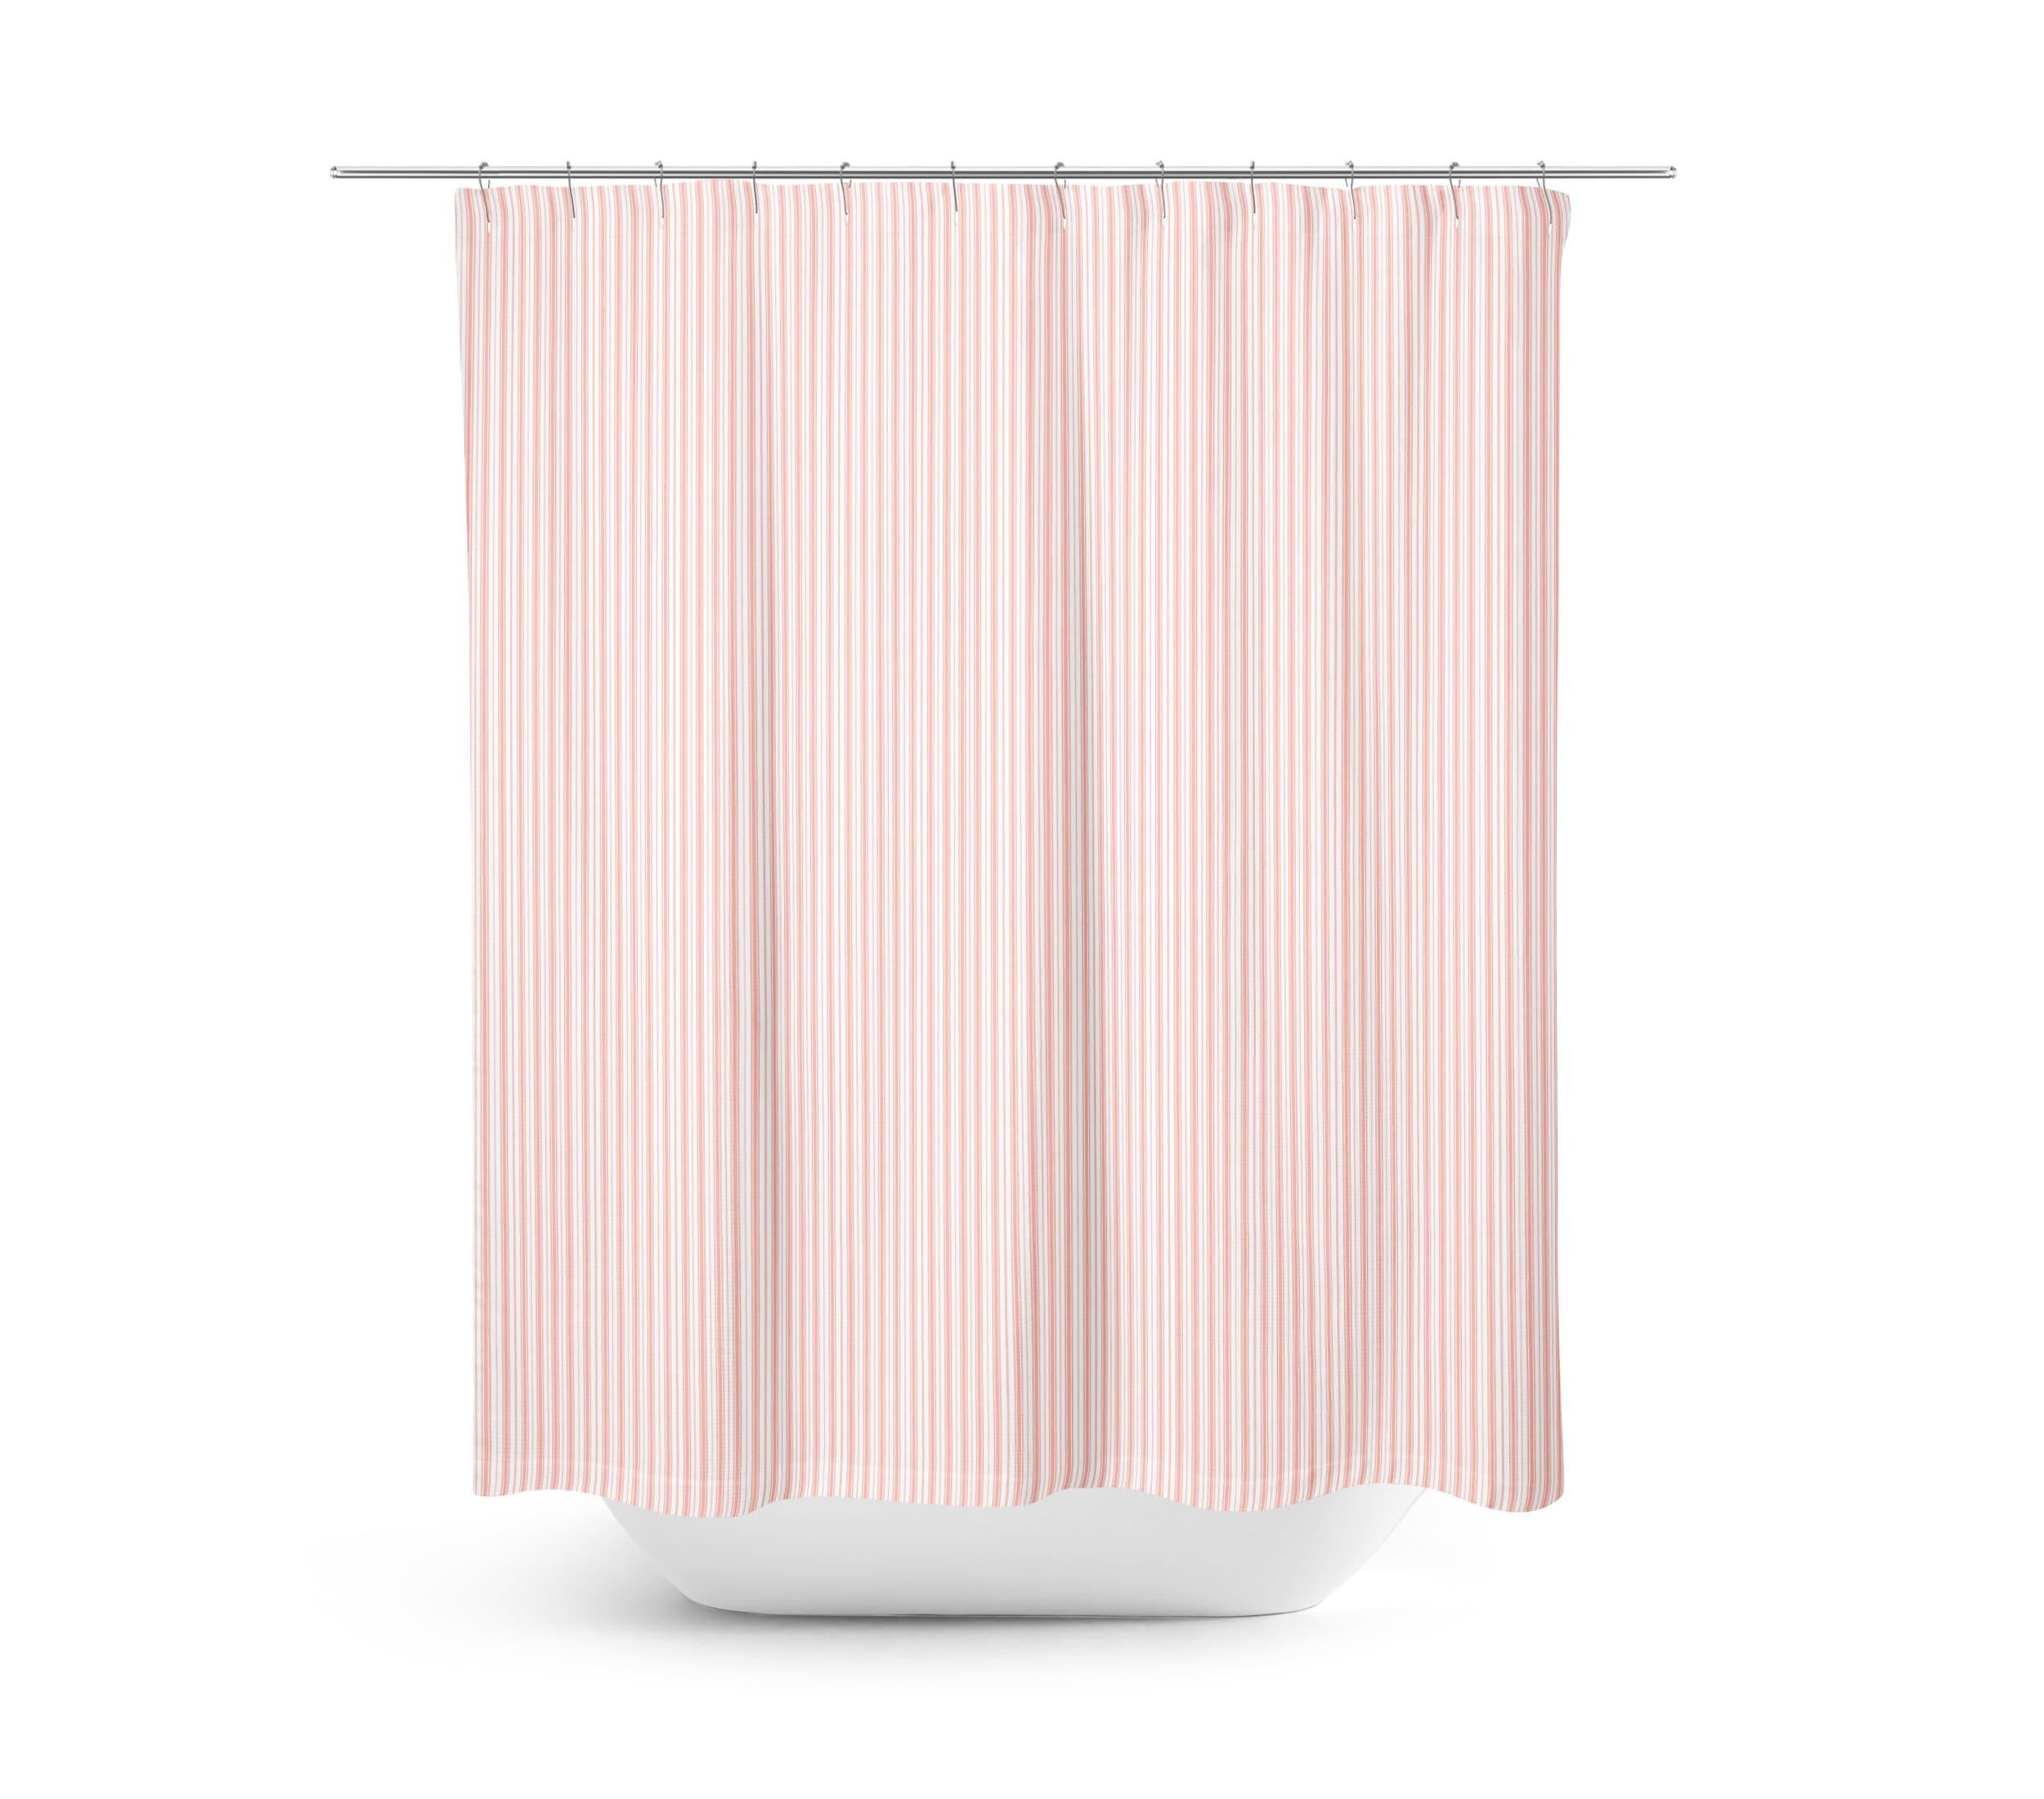 Pink Ticking Shower Curtain Farmhouse Bathroom Decor Light Girl Country Stripes